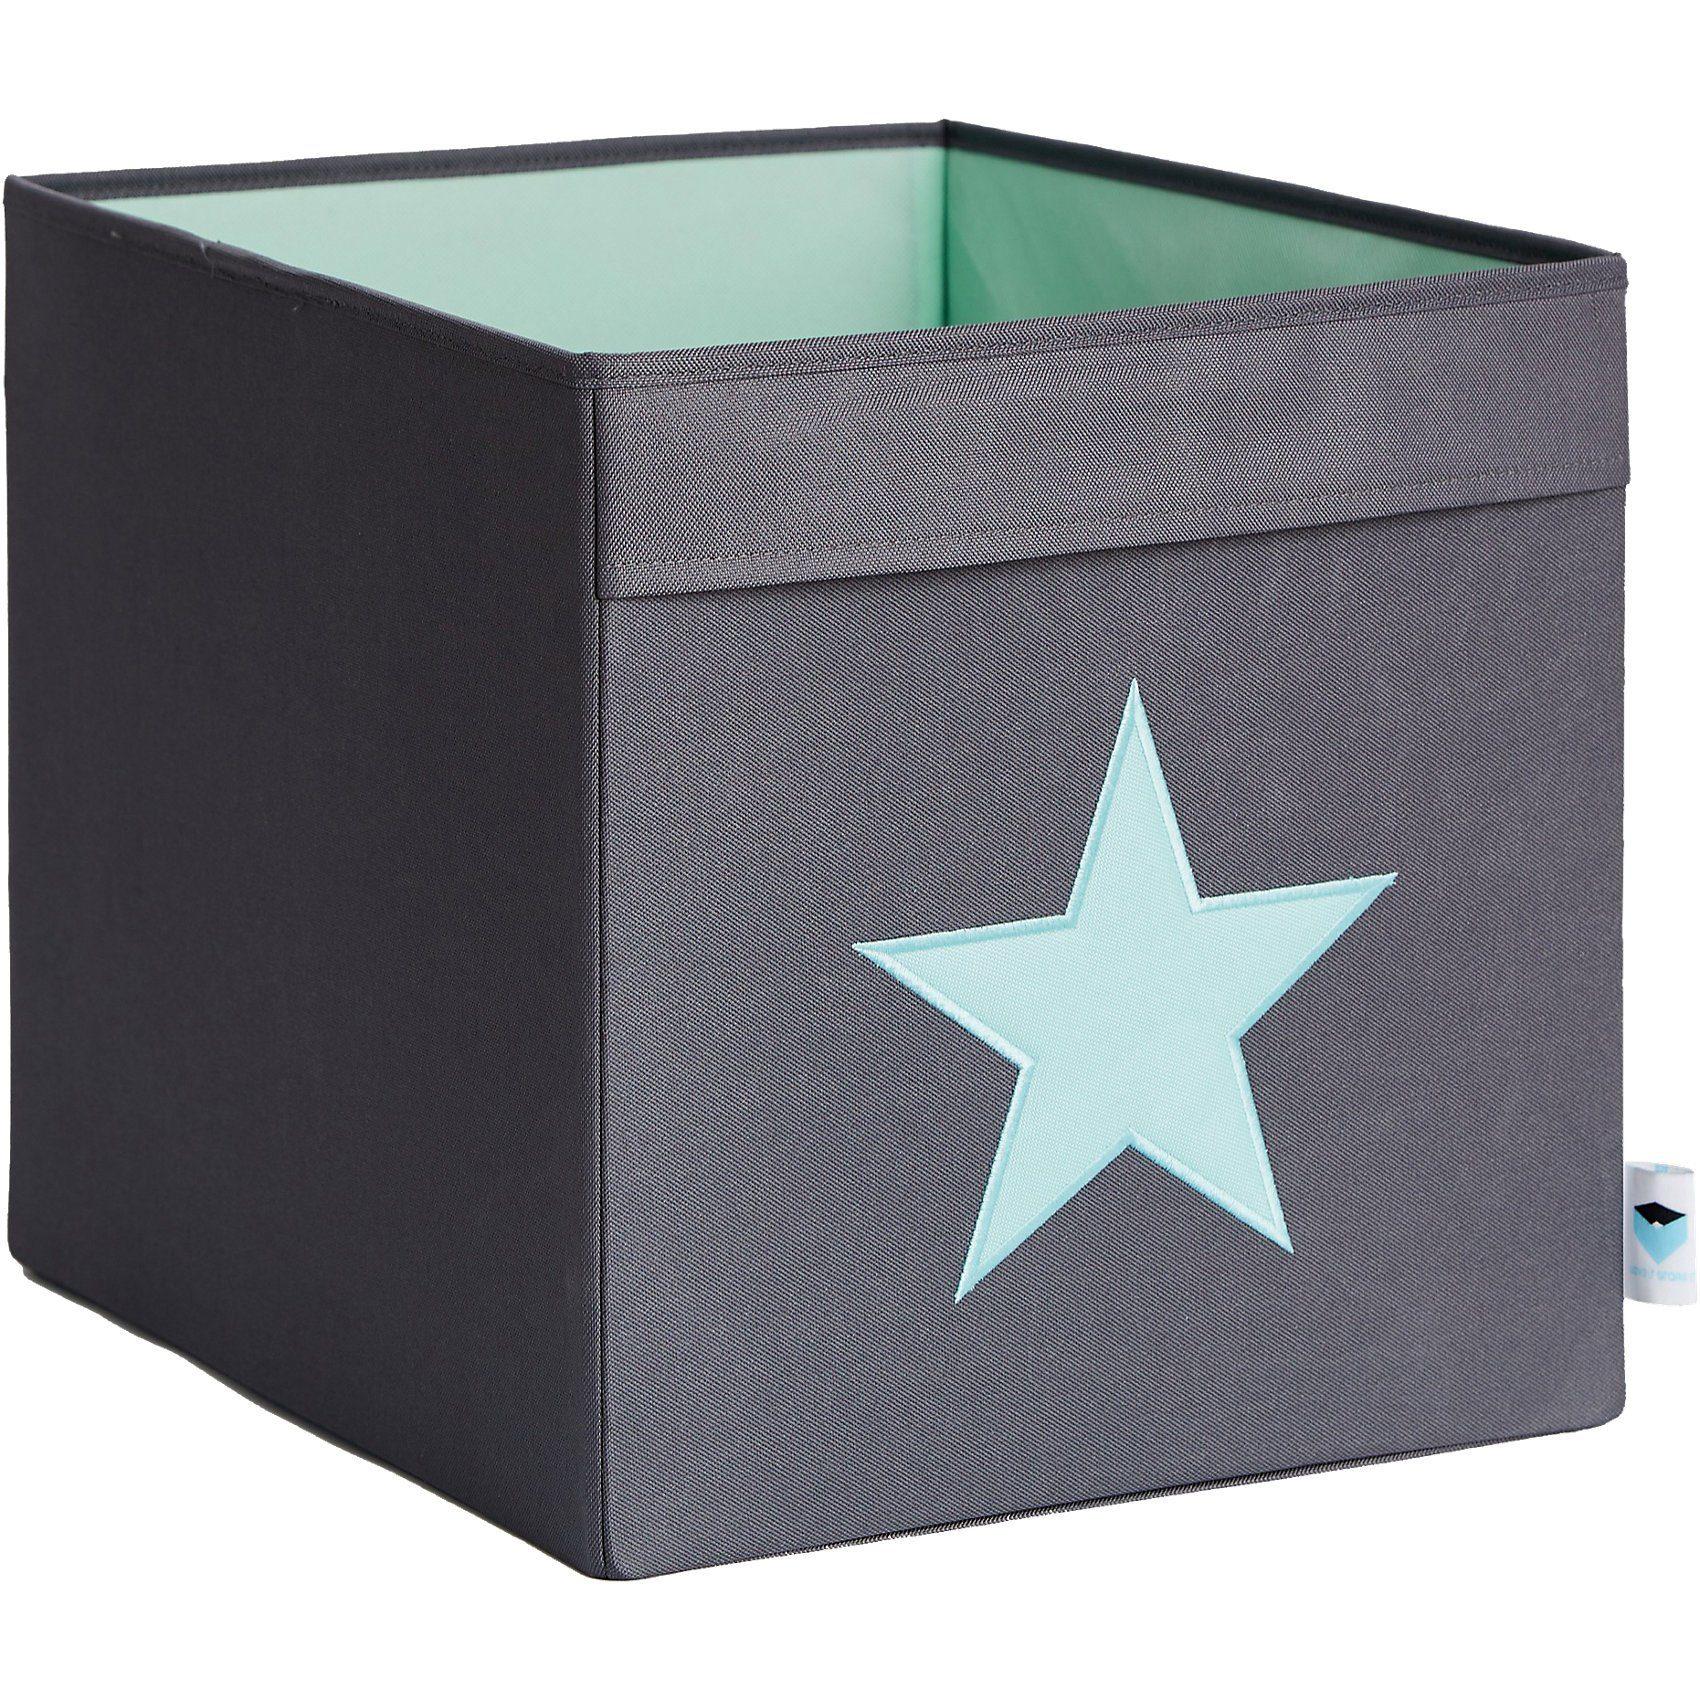 STORE IT! Aufbewahrungsbox, Stern, grau/mint